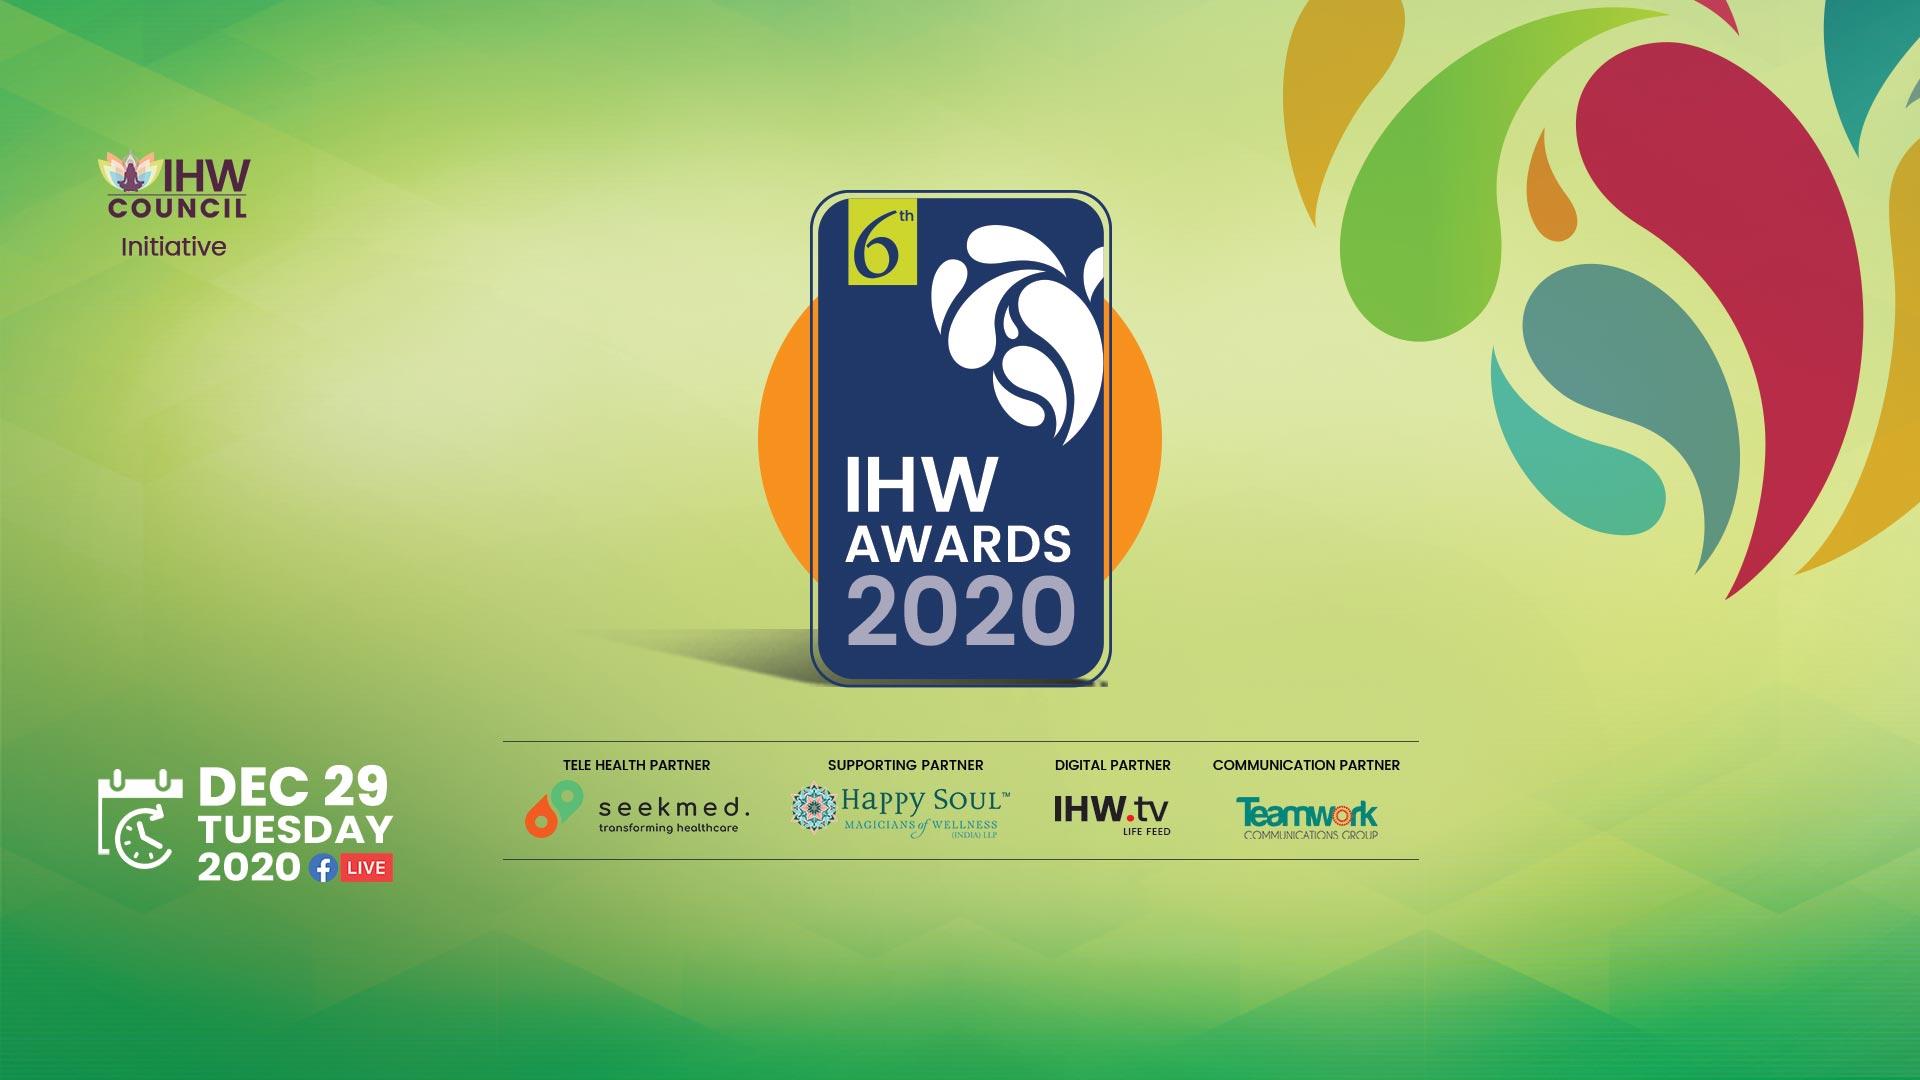 IHW Awards